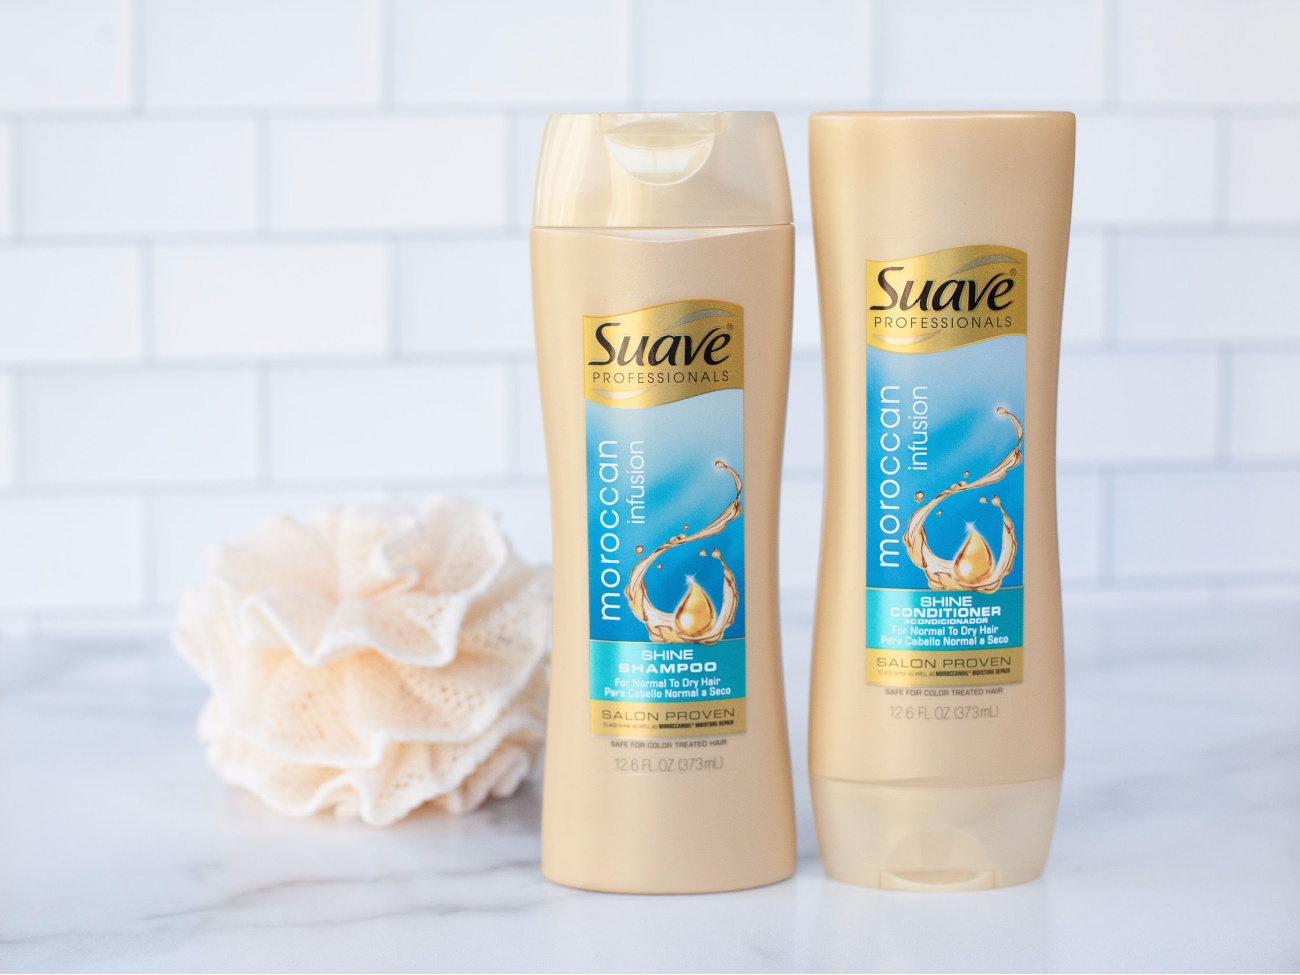 Suave Professionals Hair Care Just $1.50 At Publix on I Heart Publix 1